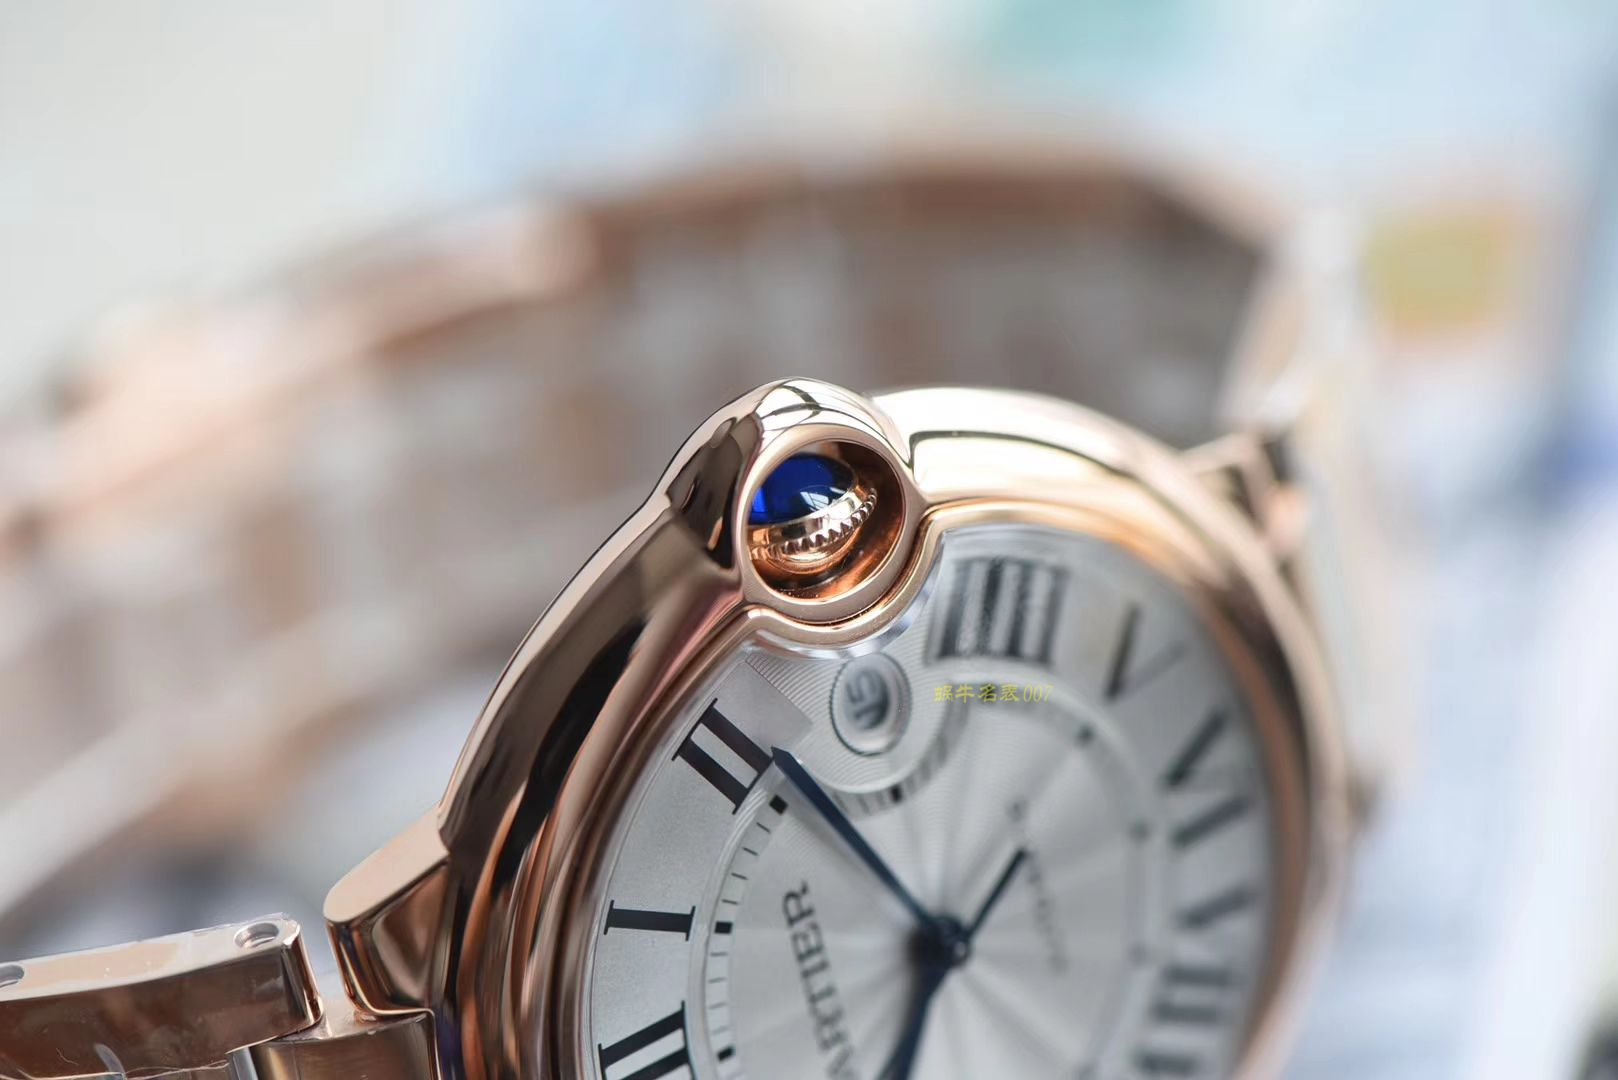 CARTIER卡地亚蓝气球系列W69006Z2腕表【一比一超A高仿手表】V6厂顶级蓝气球全玫瑰金款❗ / K210